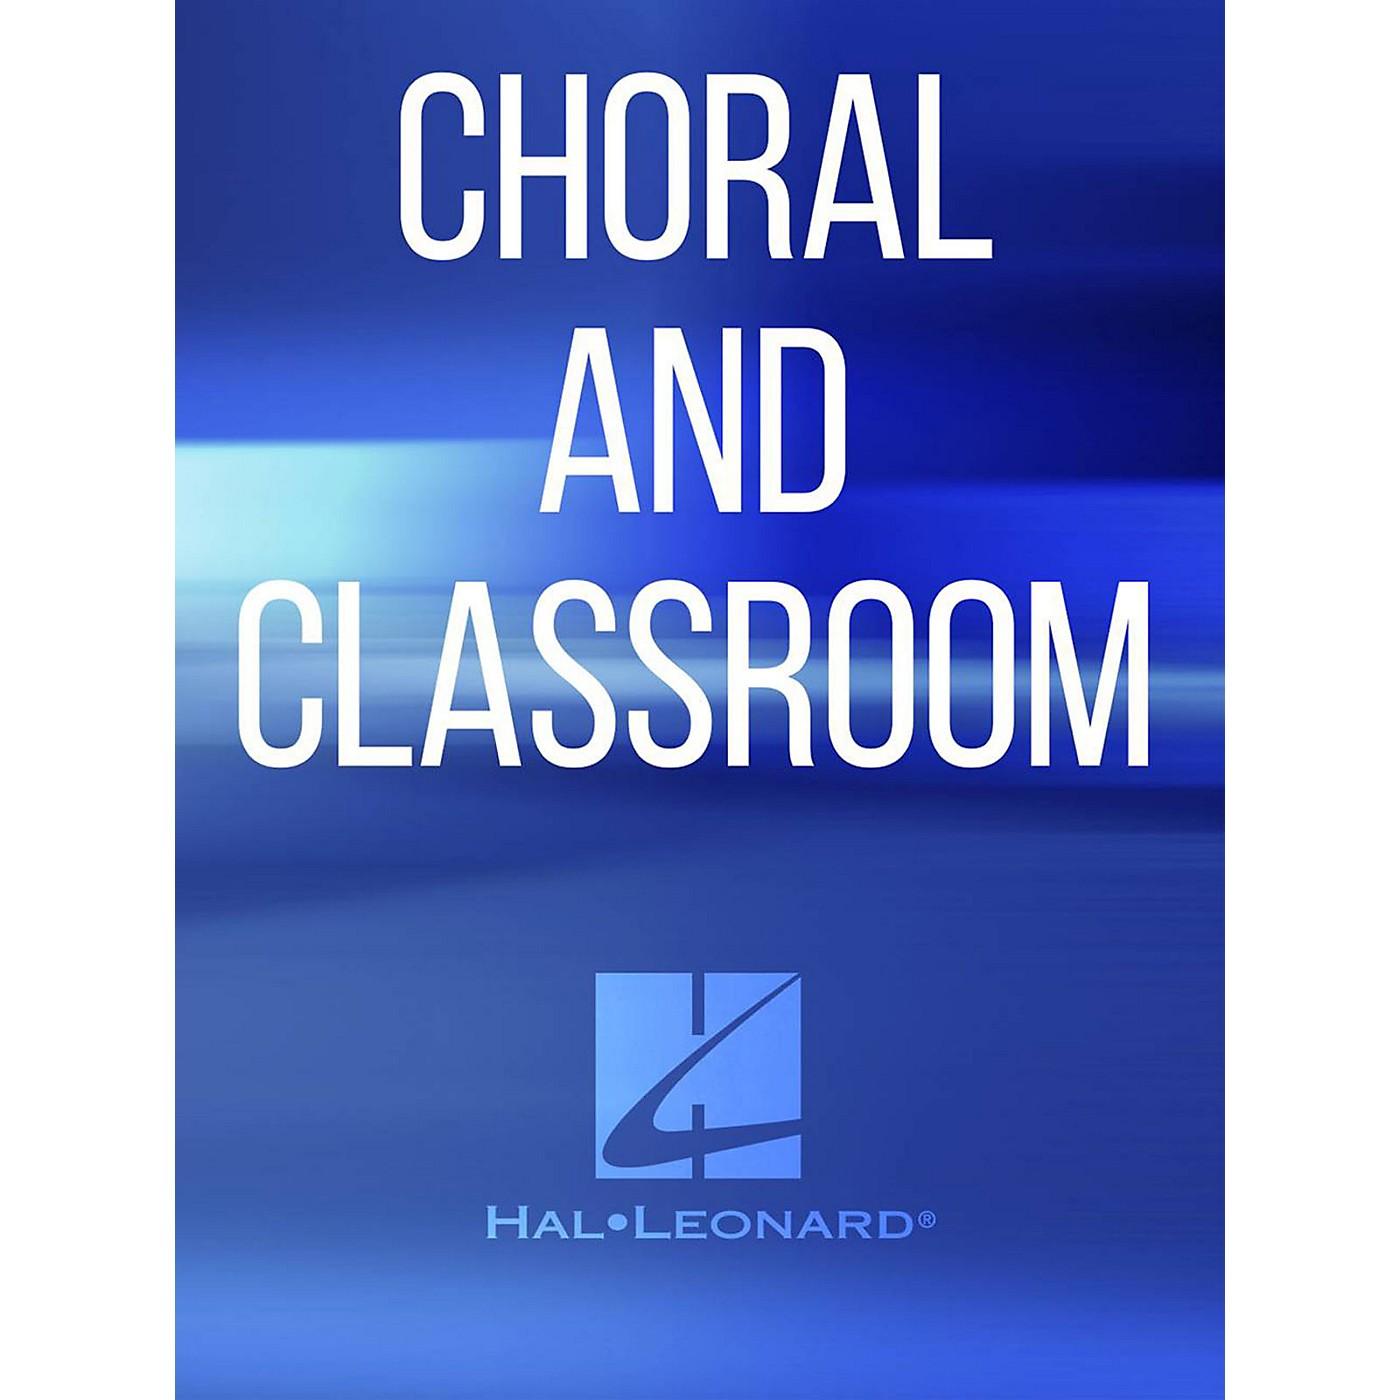 Hal Leonard Cinemagic! - Hollywood's Best Movie Music (Medley) 2-Part Score Arranged by Mac Huff thumbnail